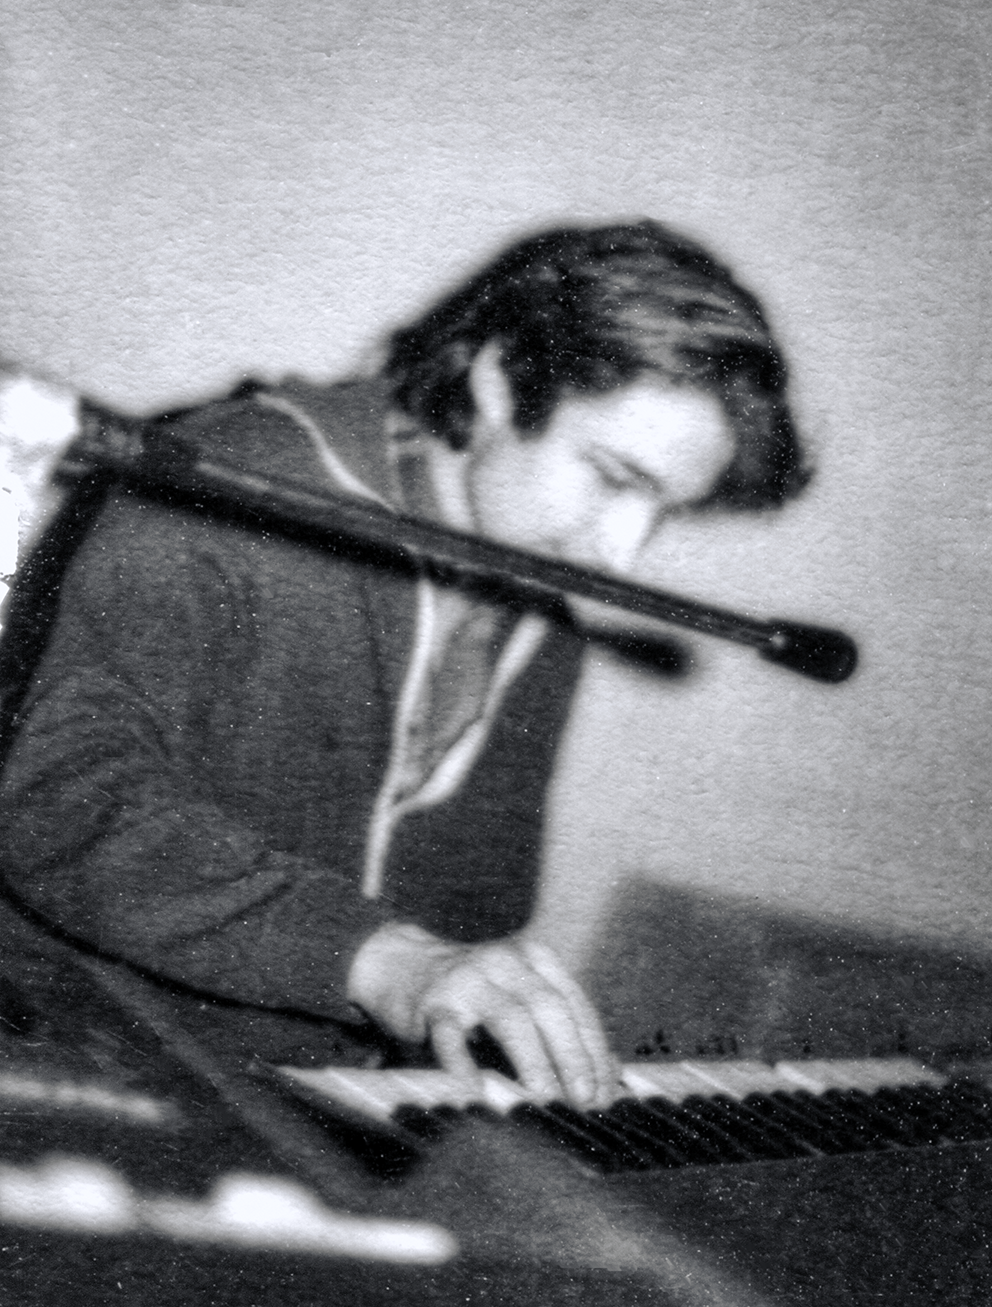 Arival (Михаил Андрияхин) (1987) - 001